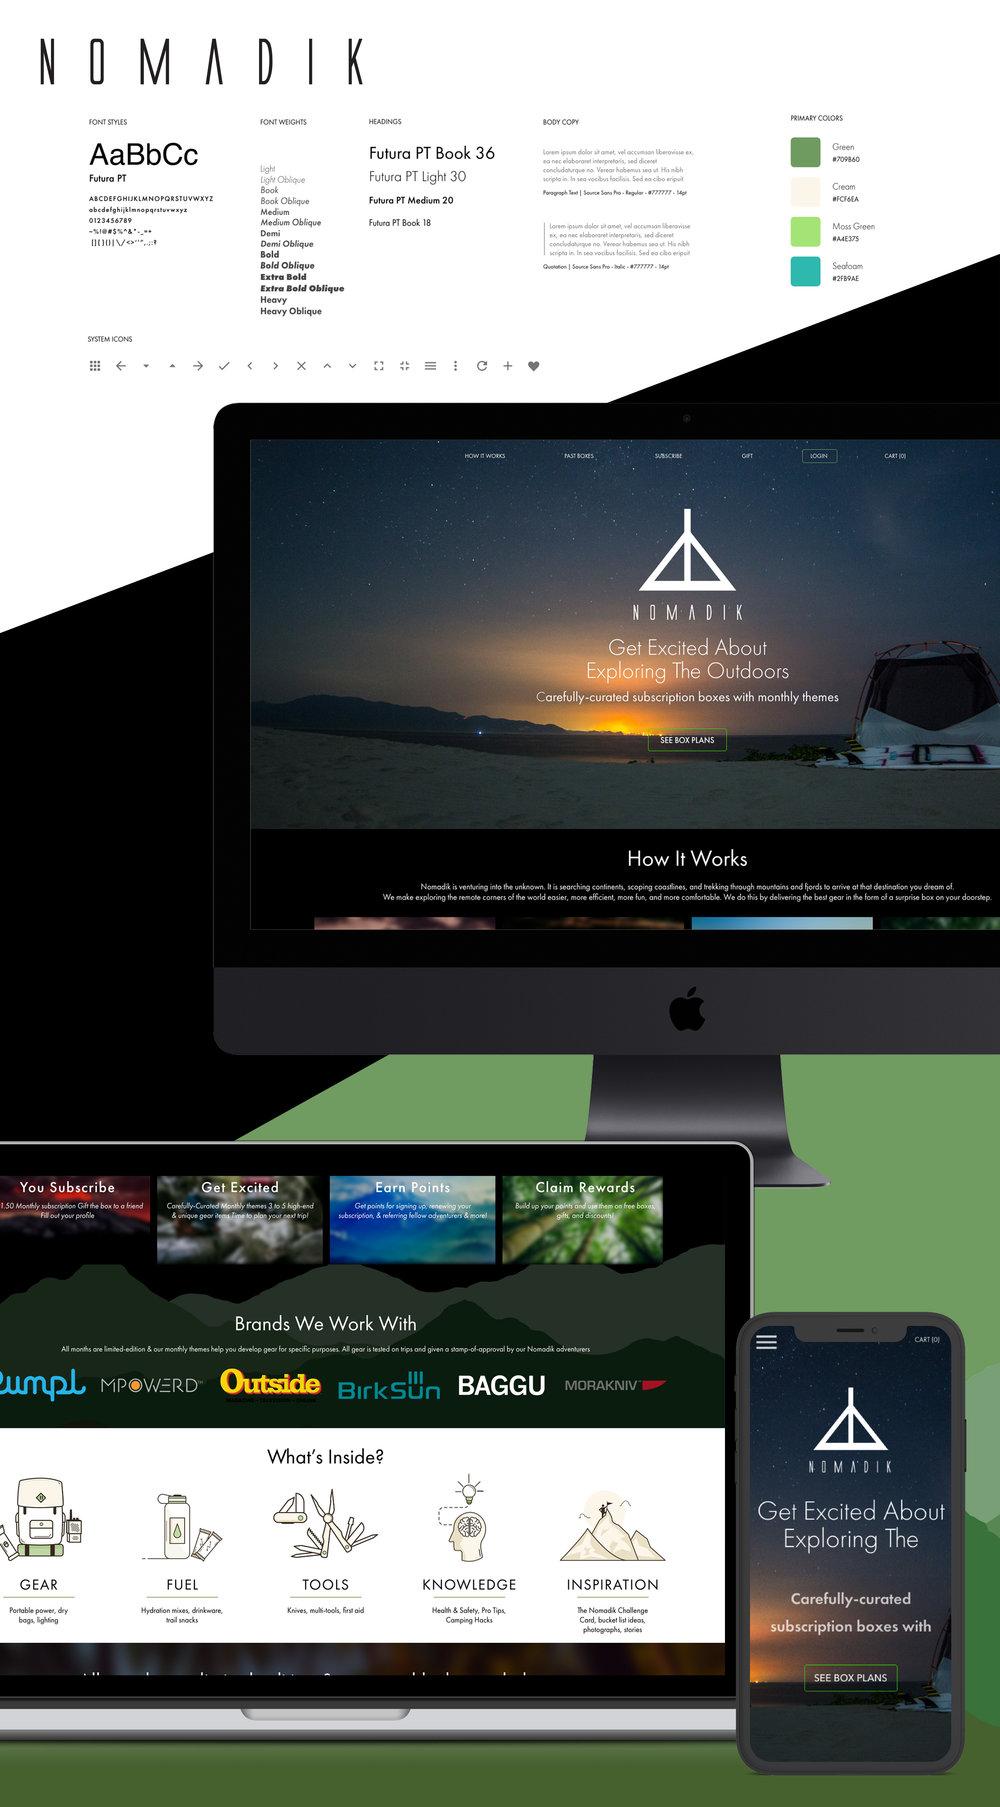 nomadik-display.jpg